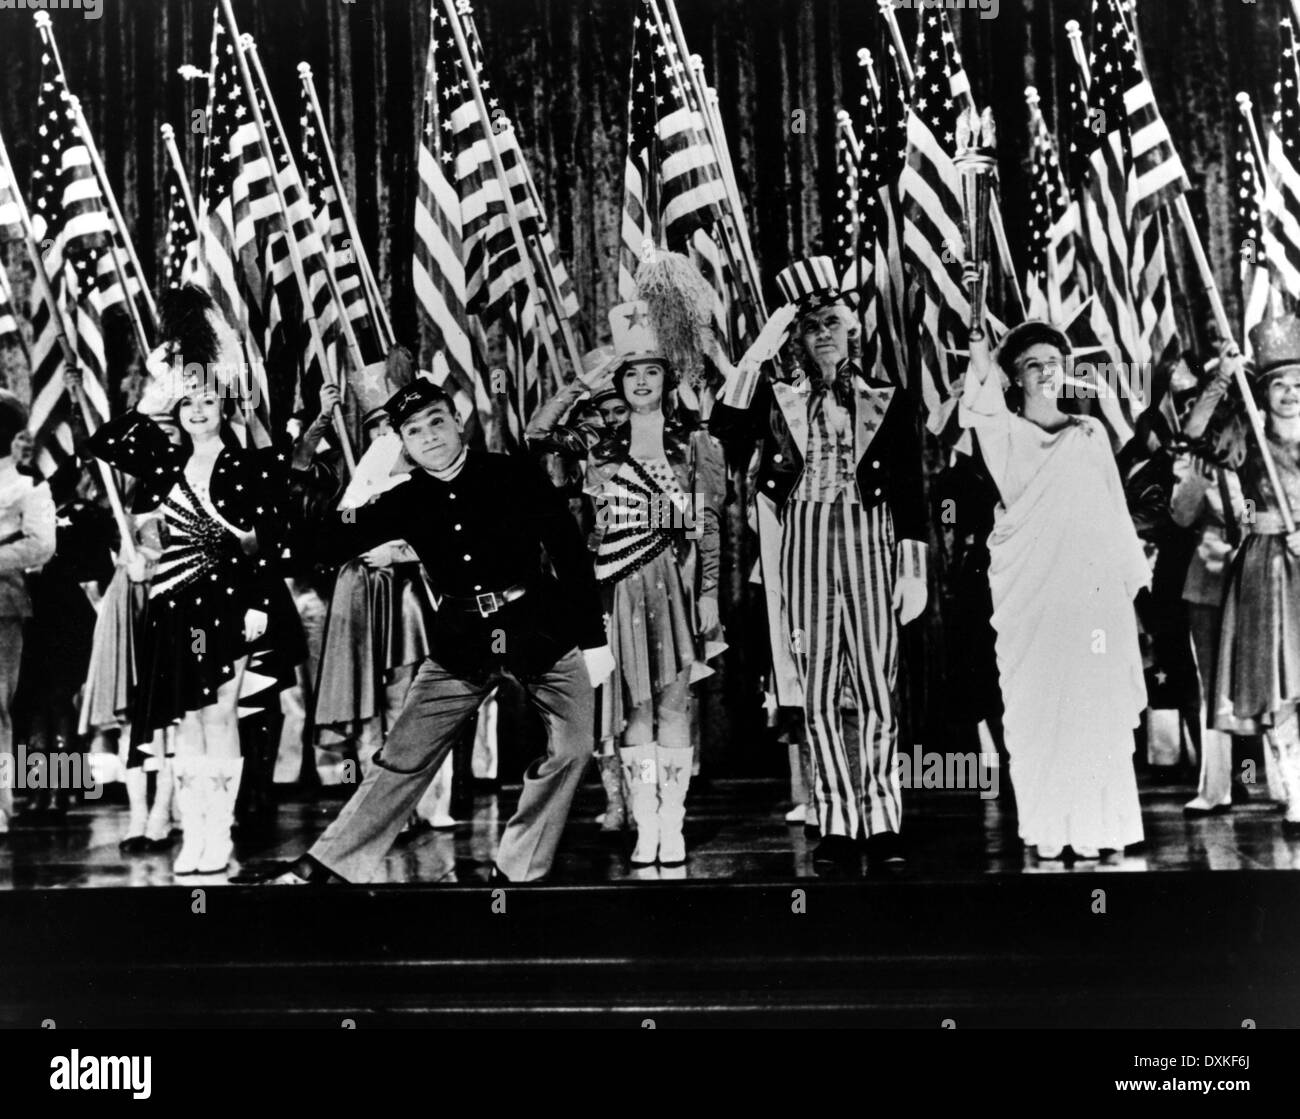 YANKEE DOODLE DANDY (US1942) WARNER BROS James Cagney Immagini Stock